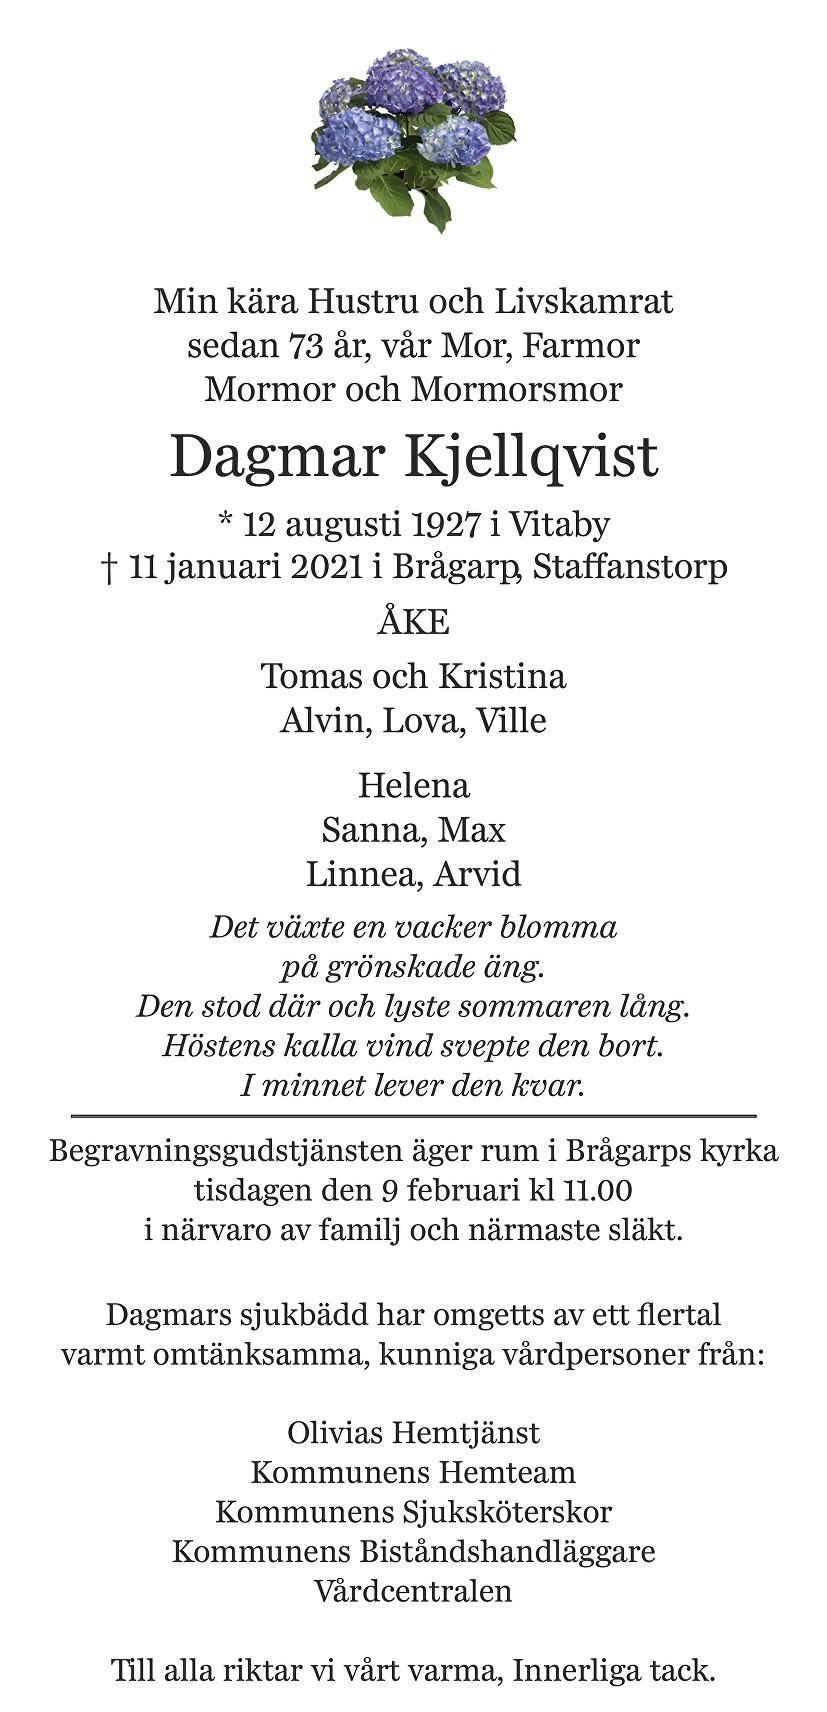 Dagmar Kjellqvist Death notice